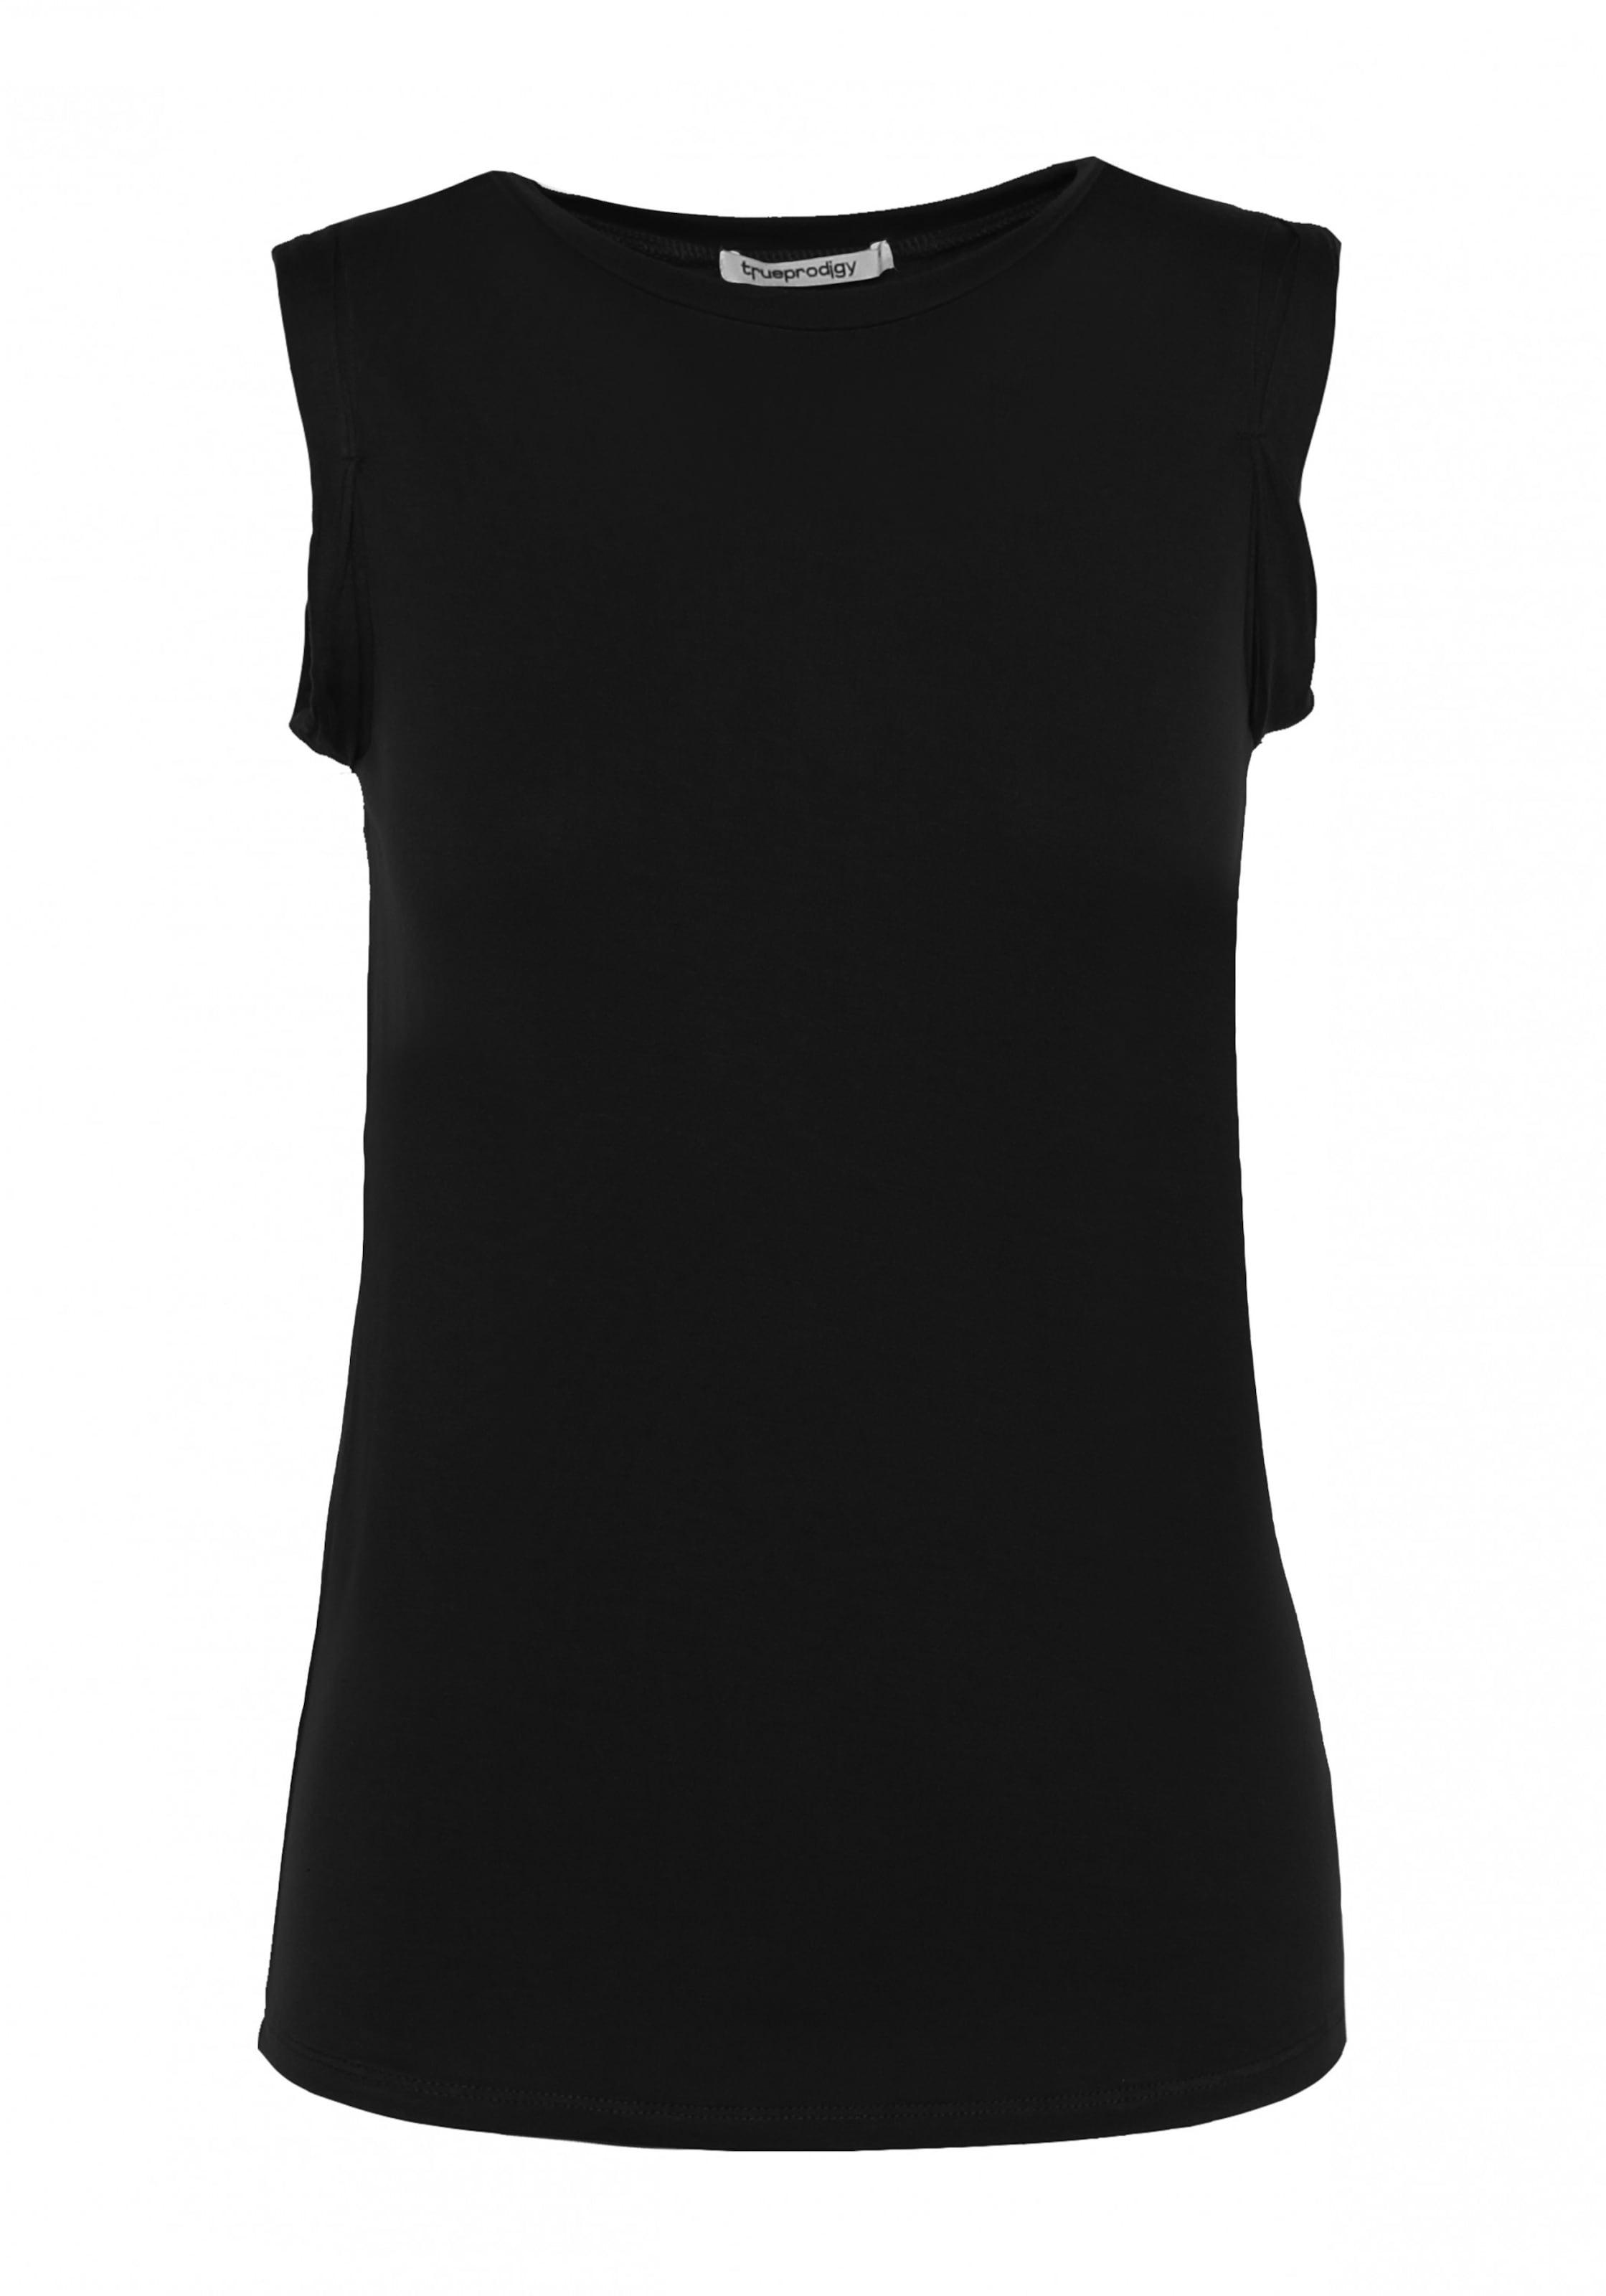 Shirt Shirt Trueprodigy Schwarz Trueprodigy In MqUpGzVS